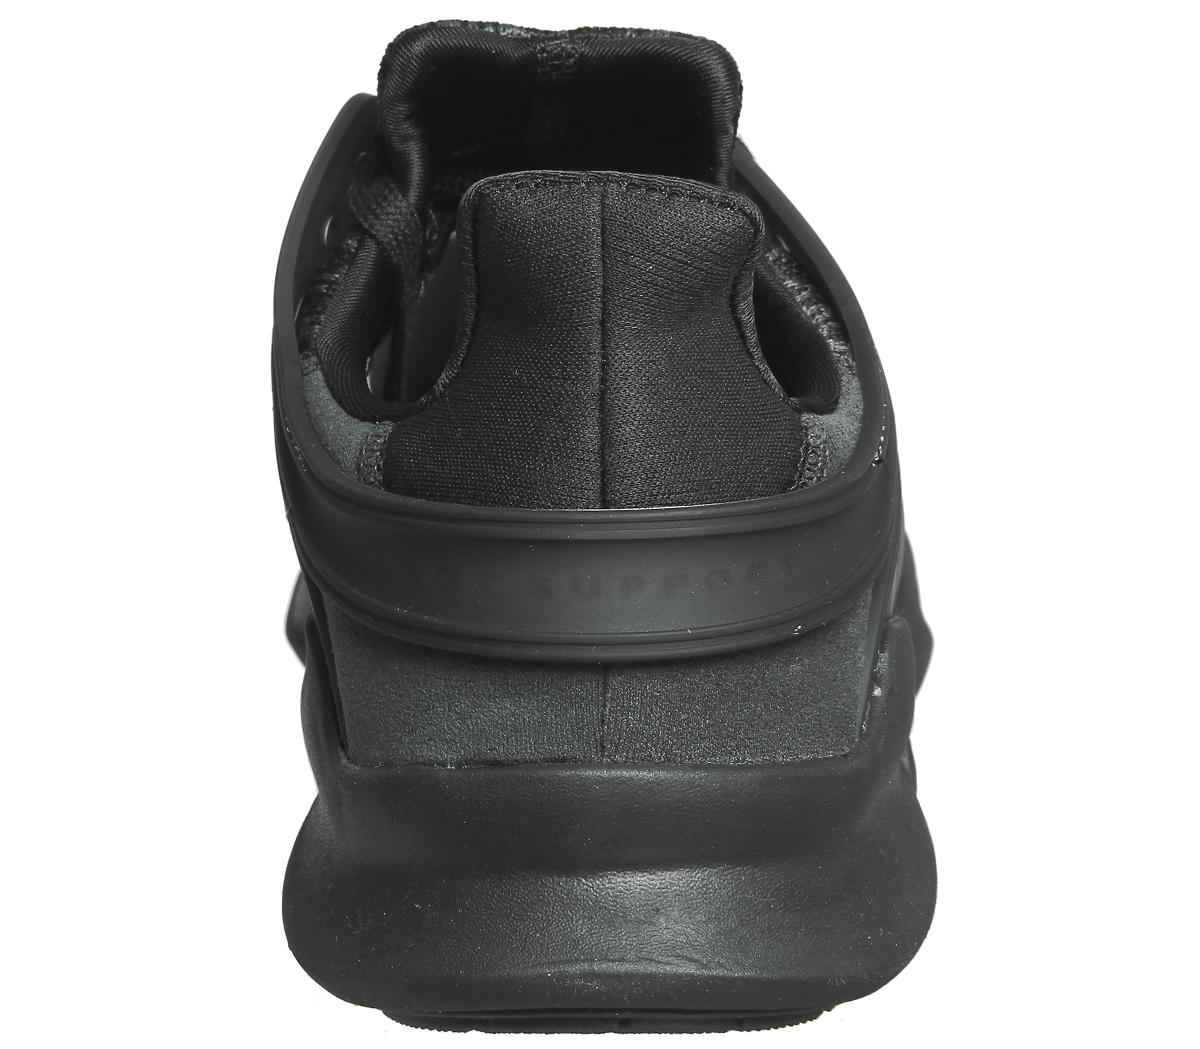 5e967c50a0ff7 Mens Adidas Equipment Support Adv Black Mono Trainers Shoes   eBay